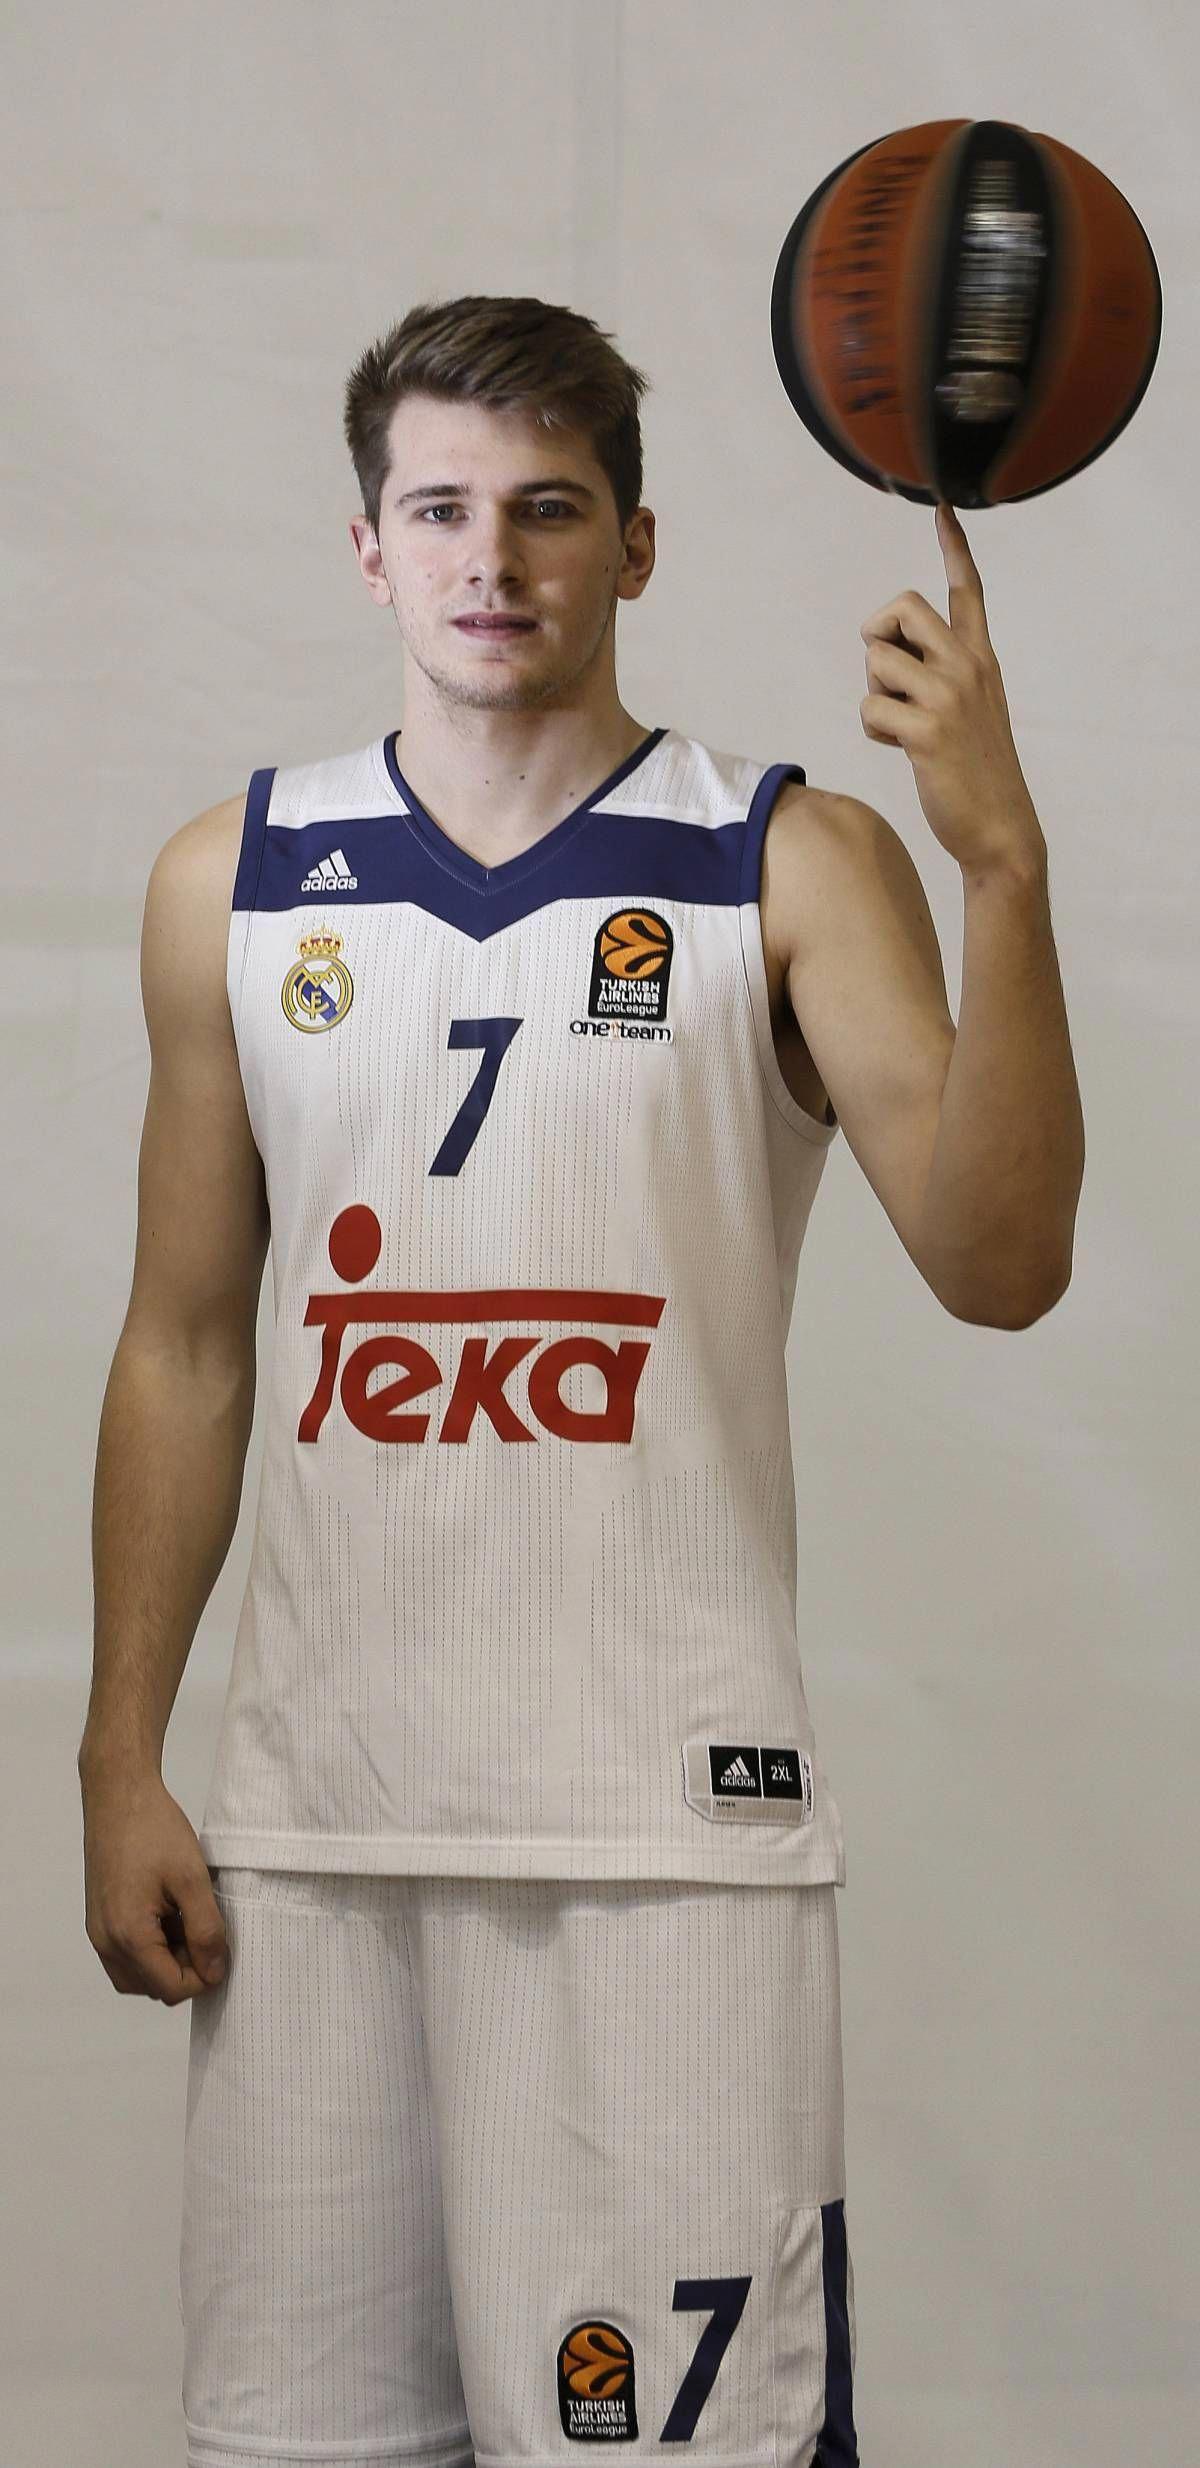 Pin On Luka Doncic